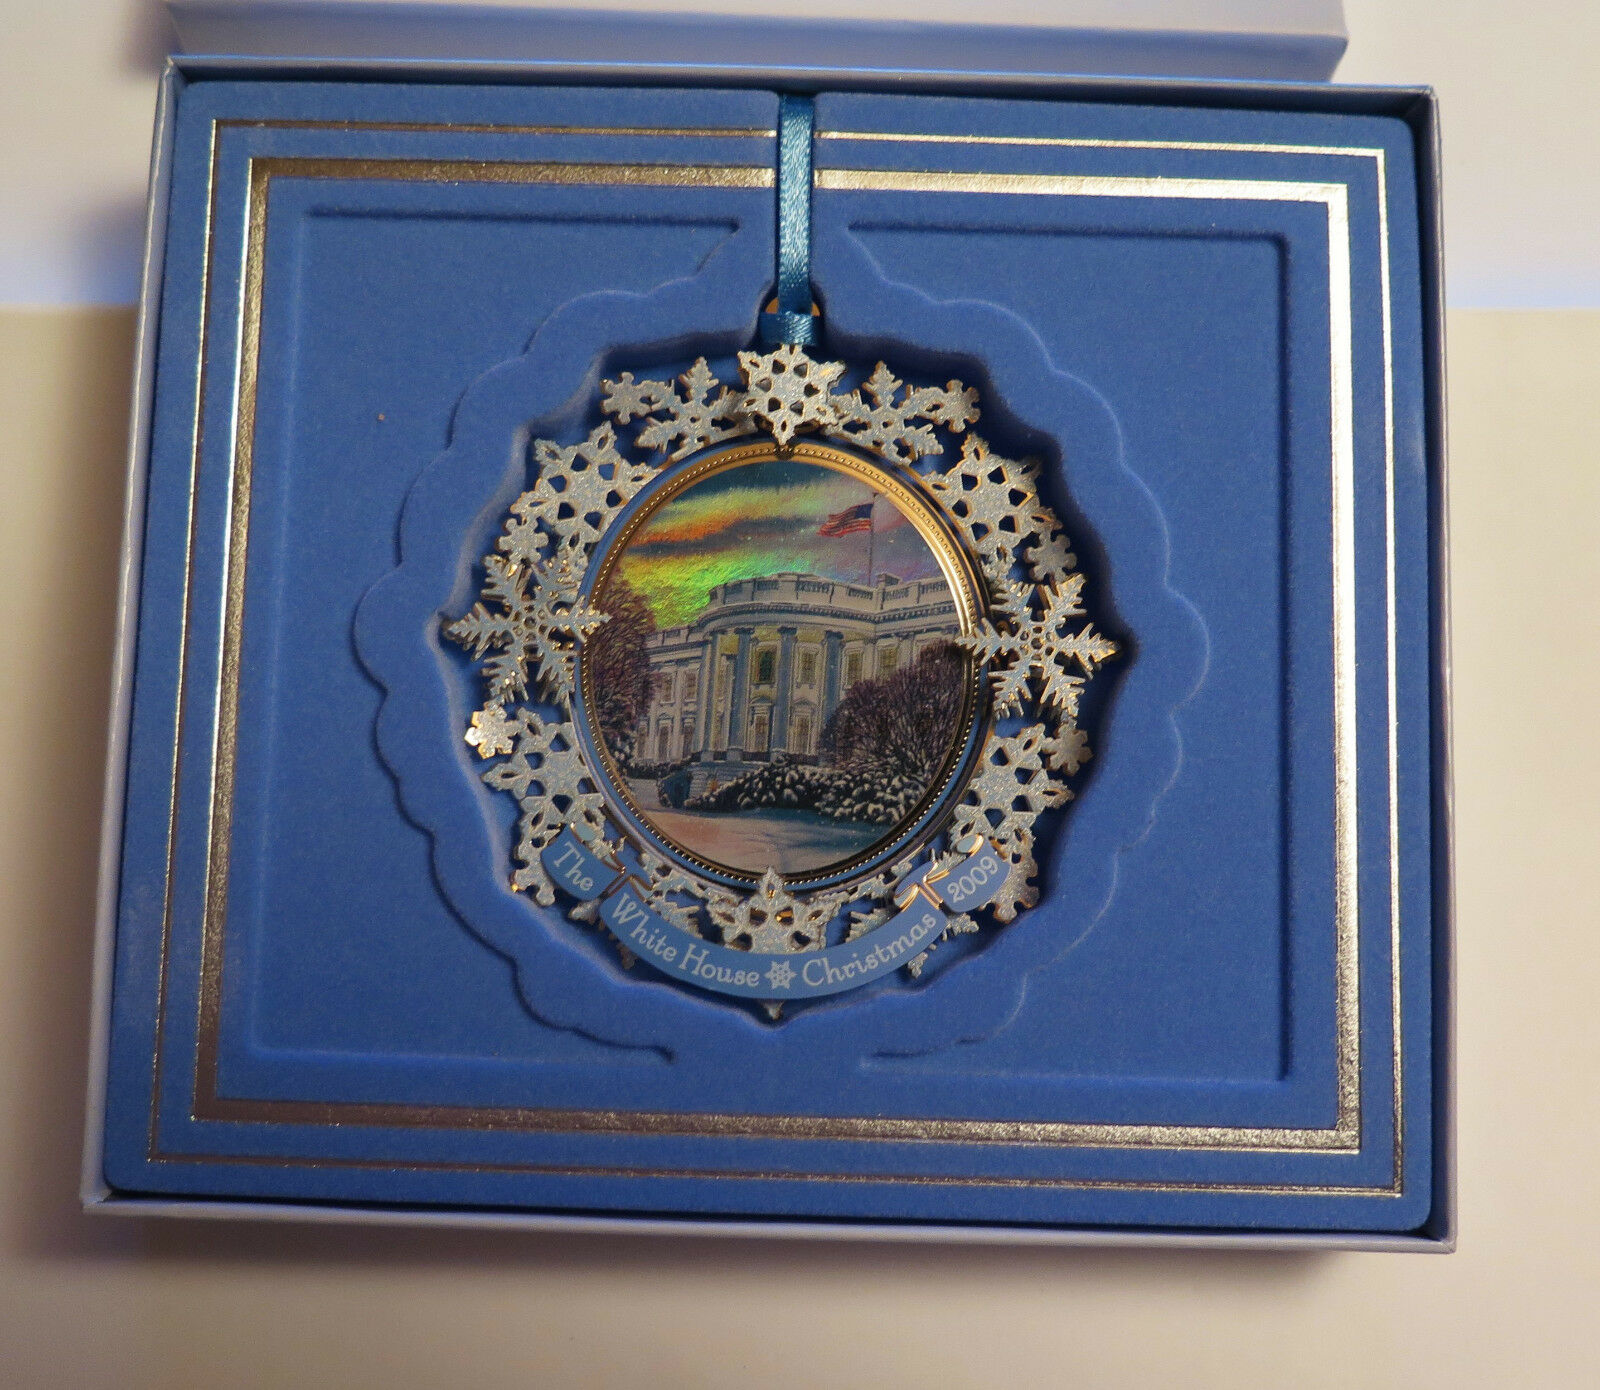 7658  gioielli di Natale, The bianca House Historical Historical Historical ASS., 2009, decorazioni natalizie  da9d9d